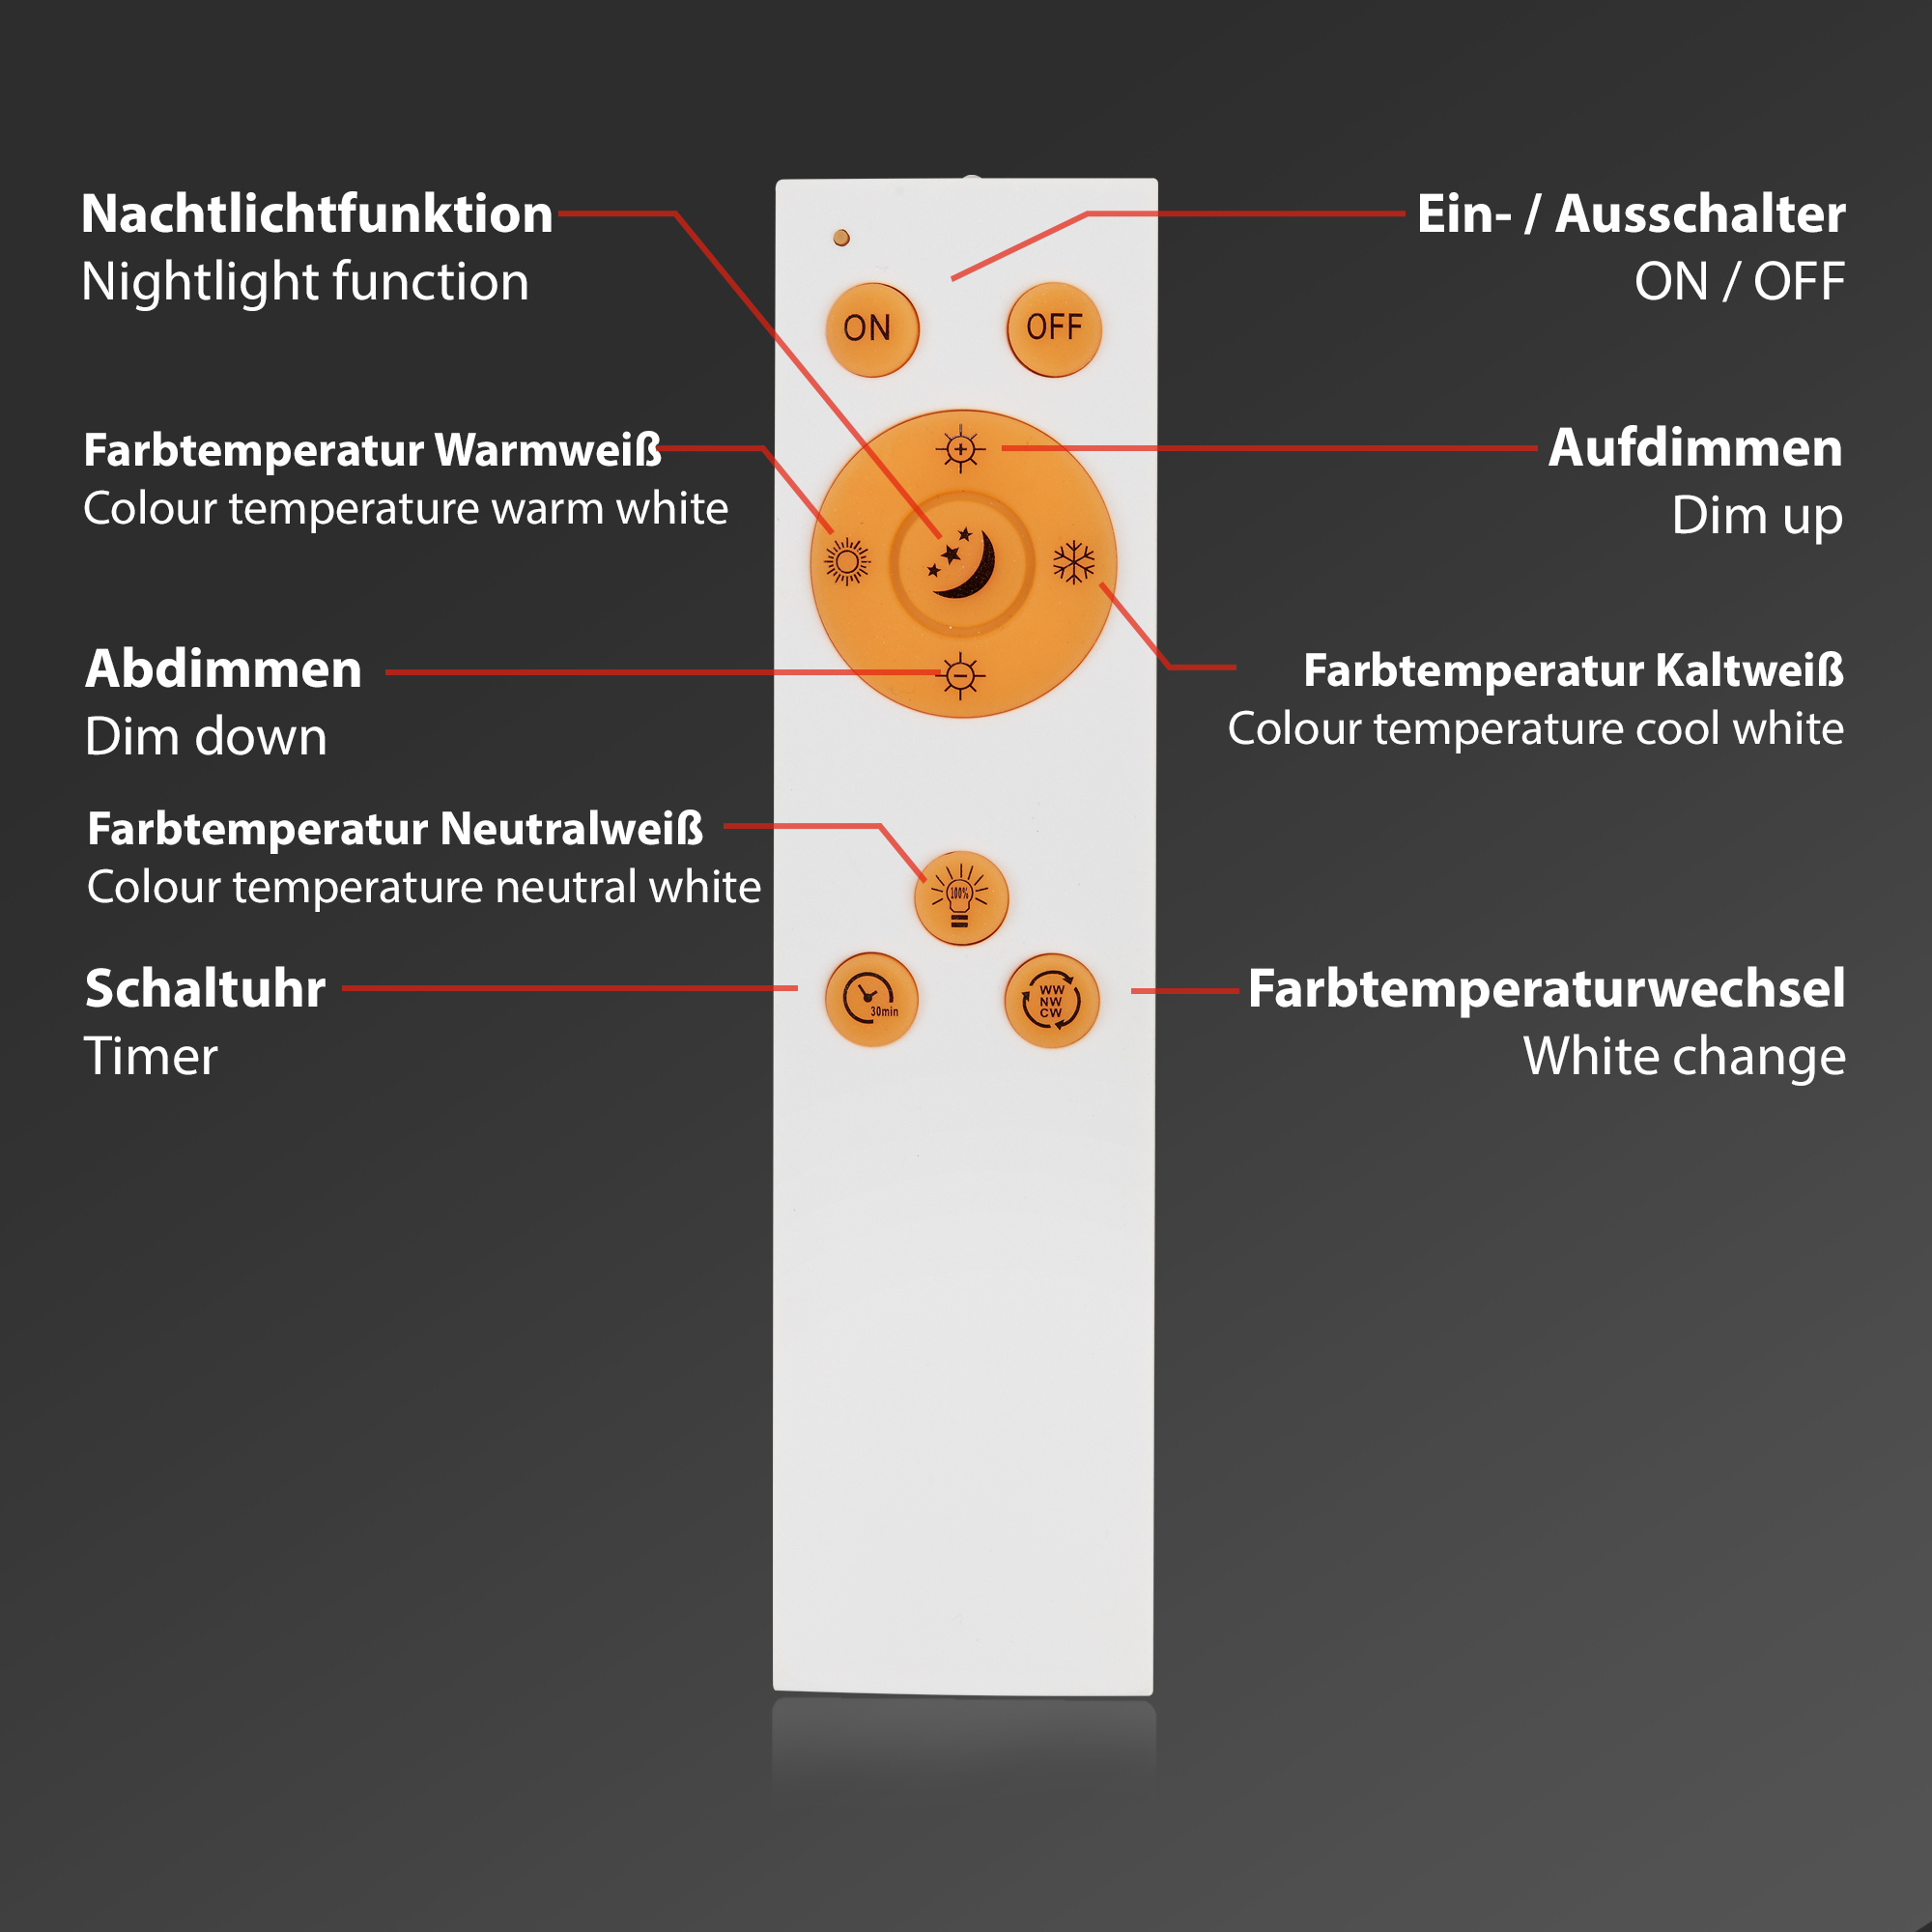 STERNENHIMMEL LED Panel Weiß Fernbedienung